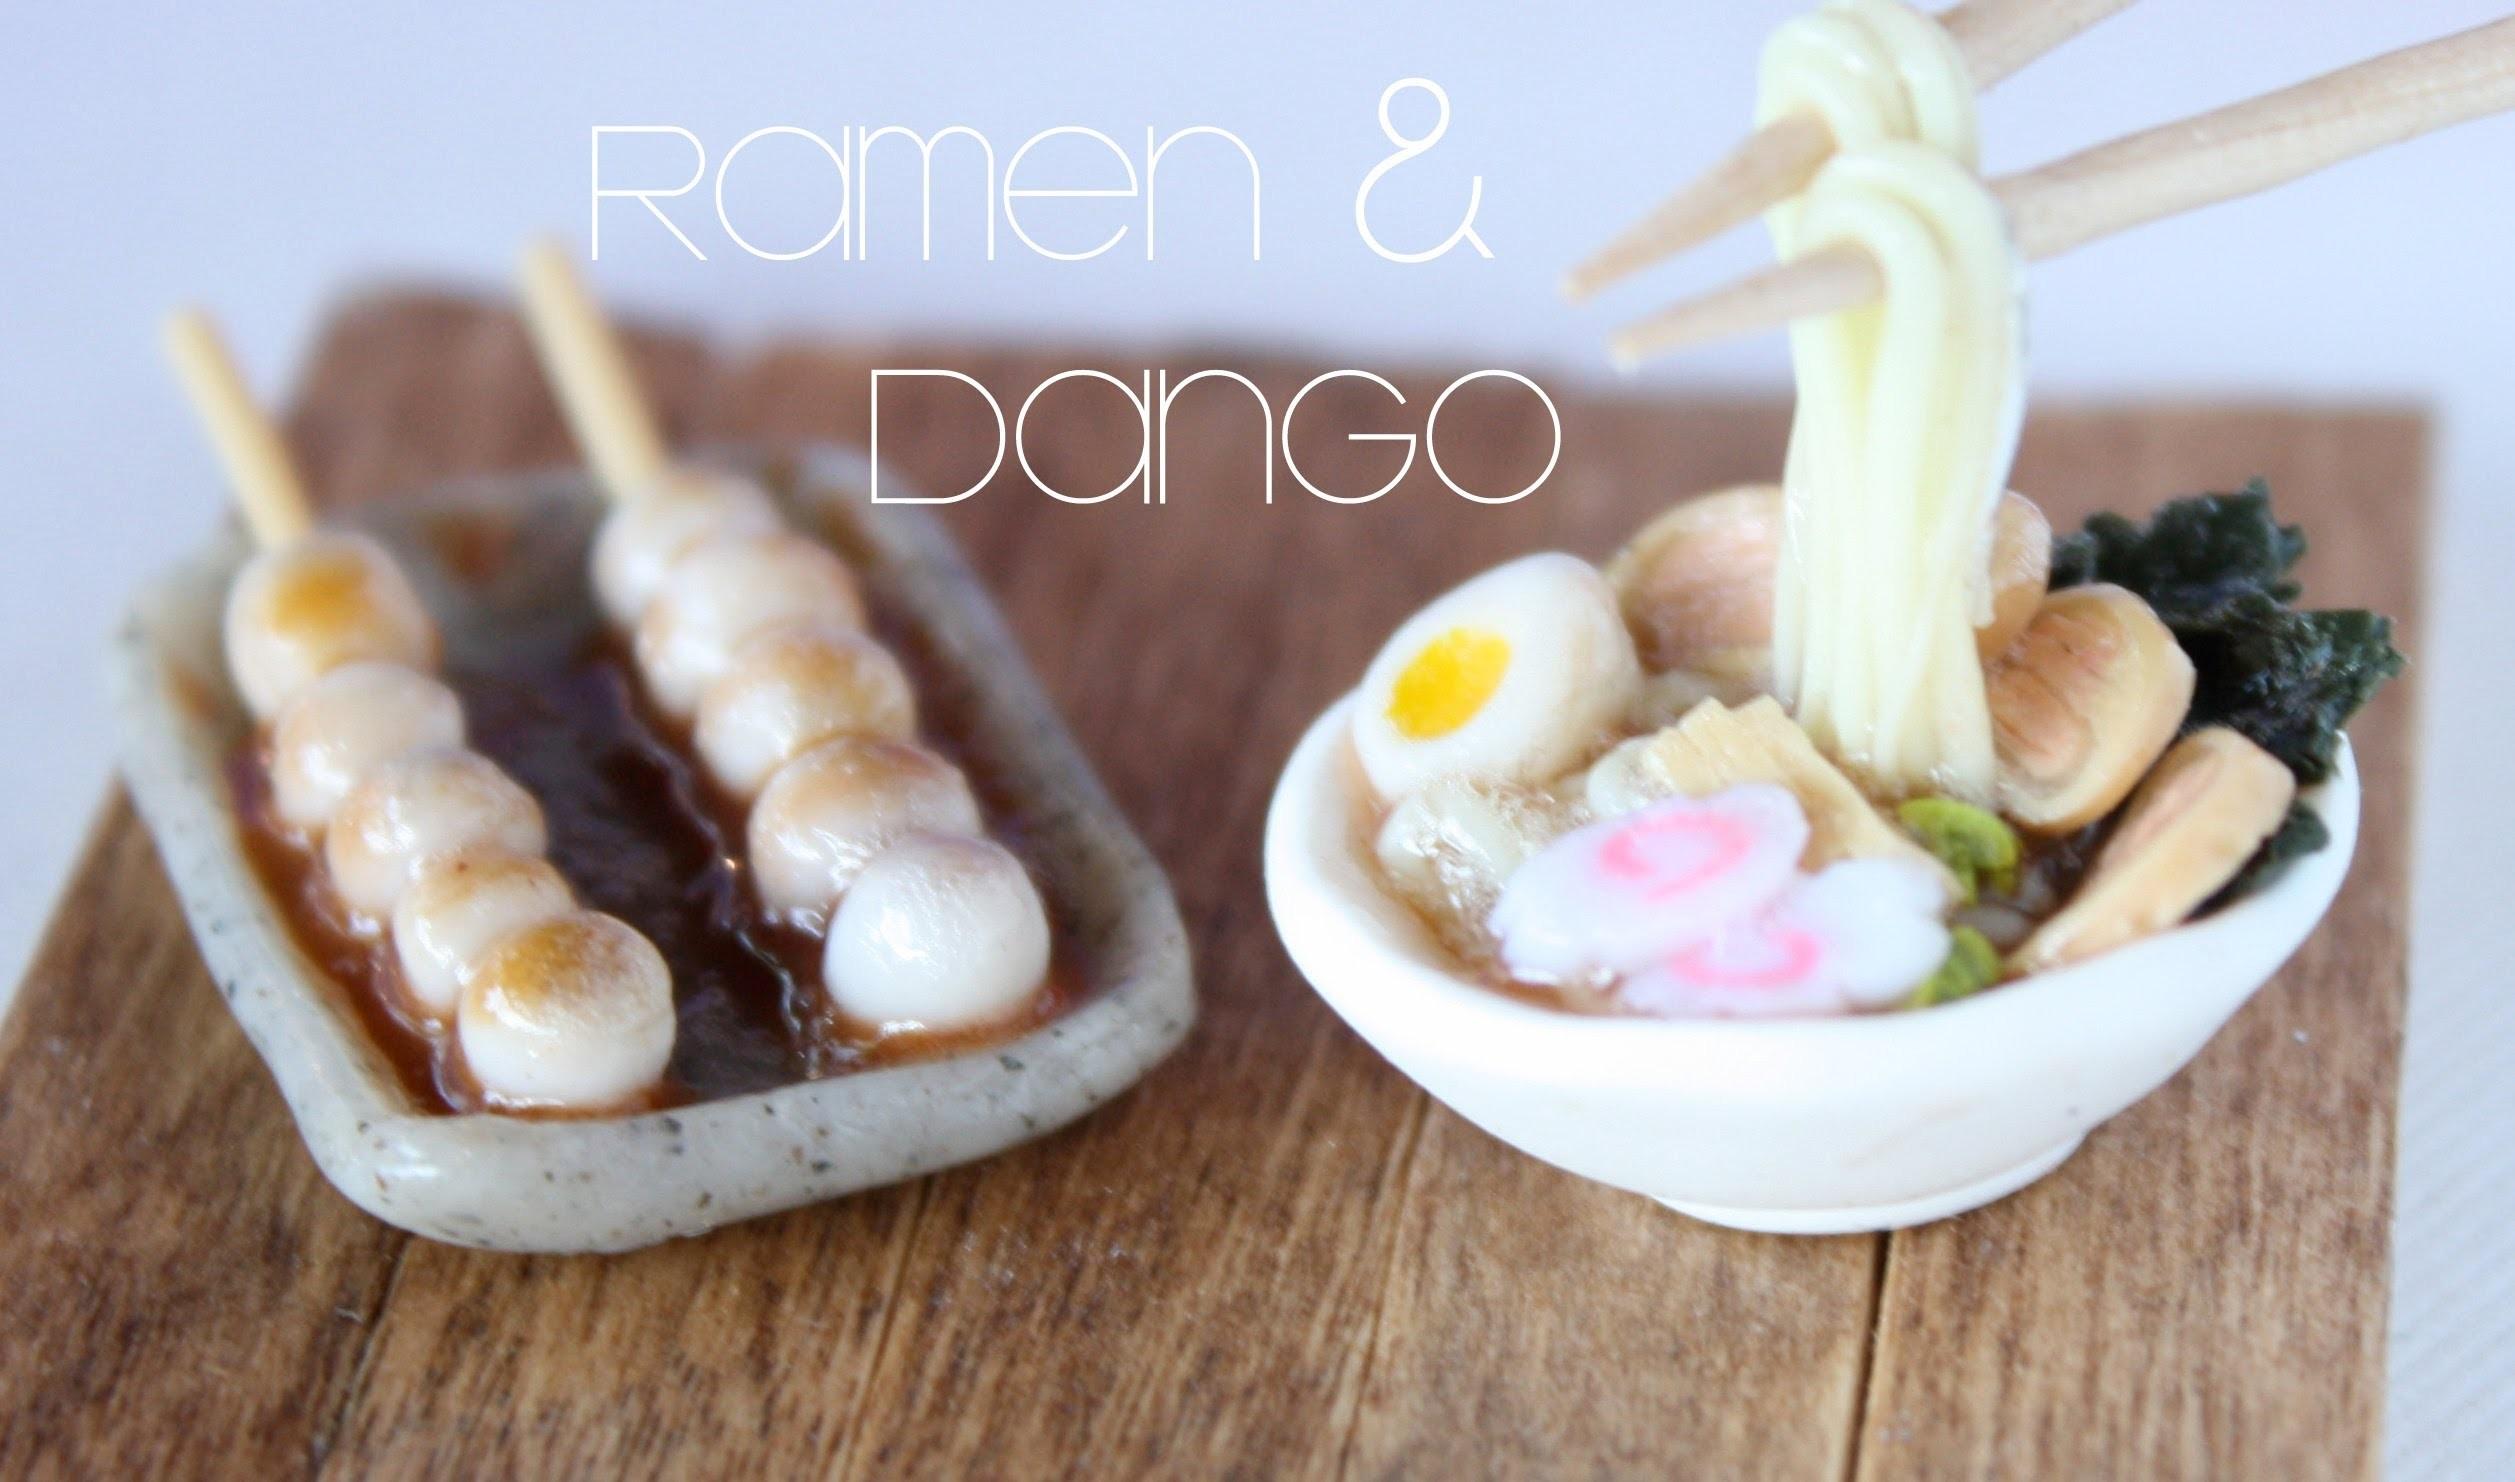 Ramen & Dango - Miniature Clay Bowl & Chopsticks Tutorial